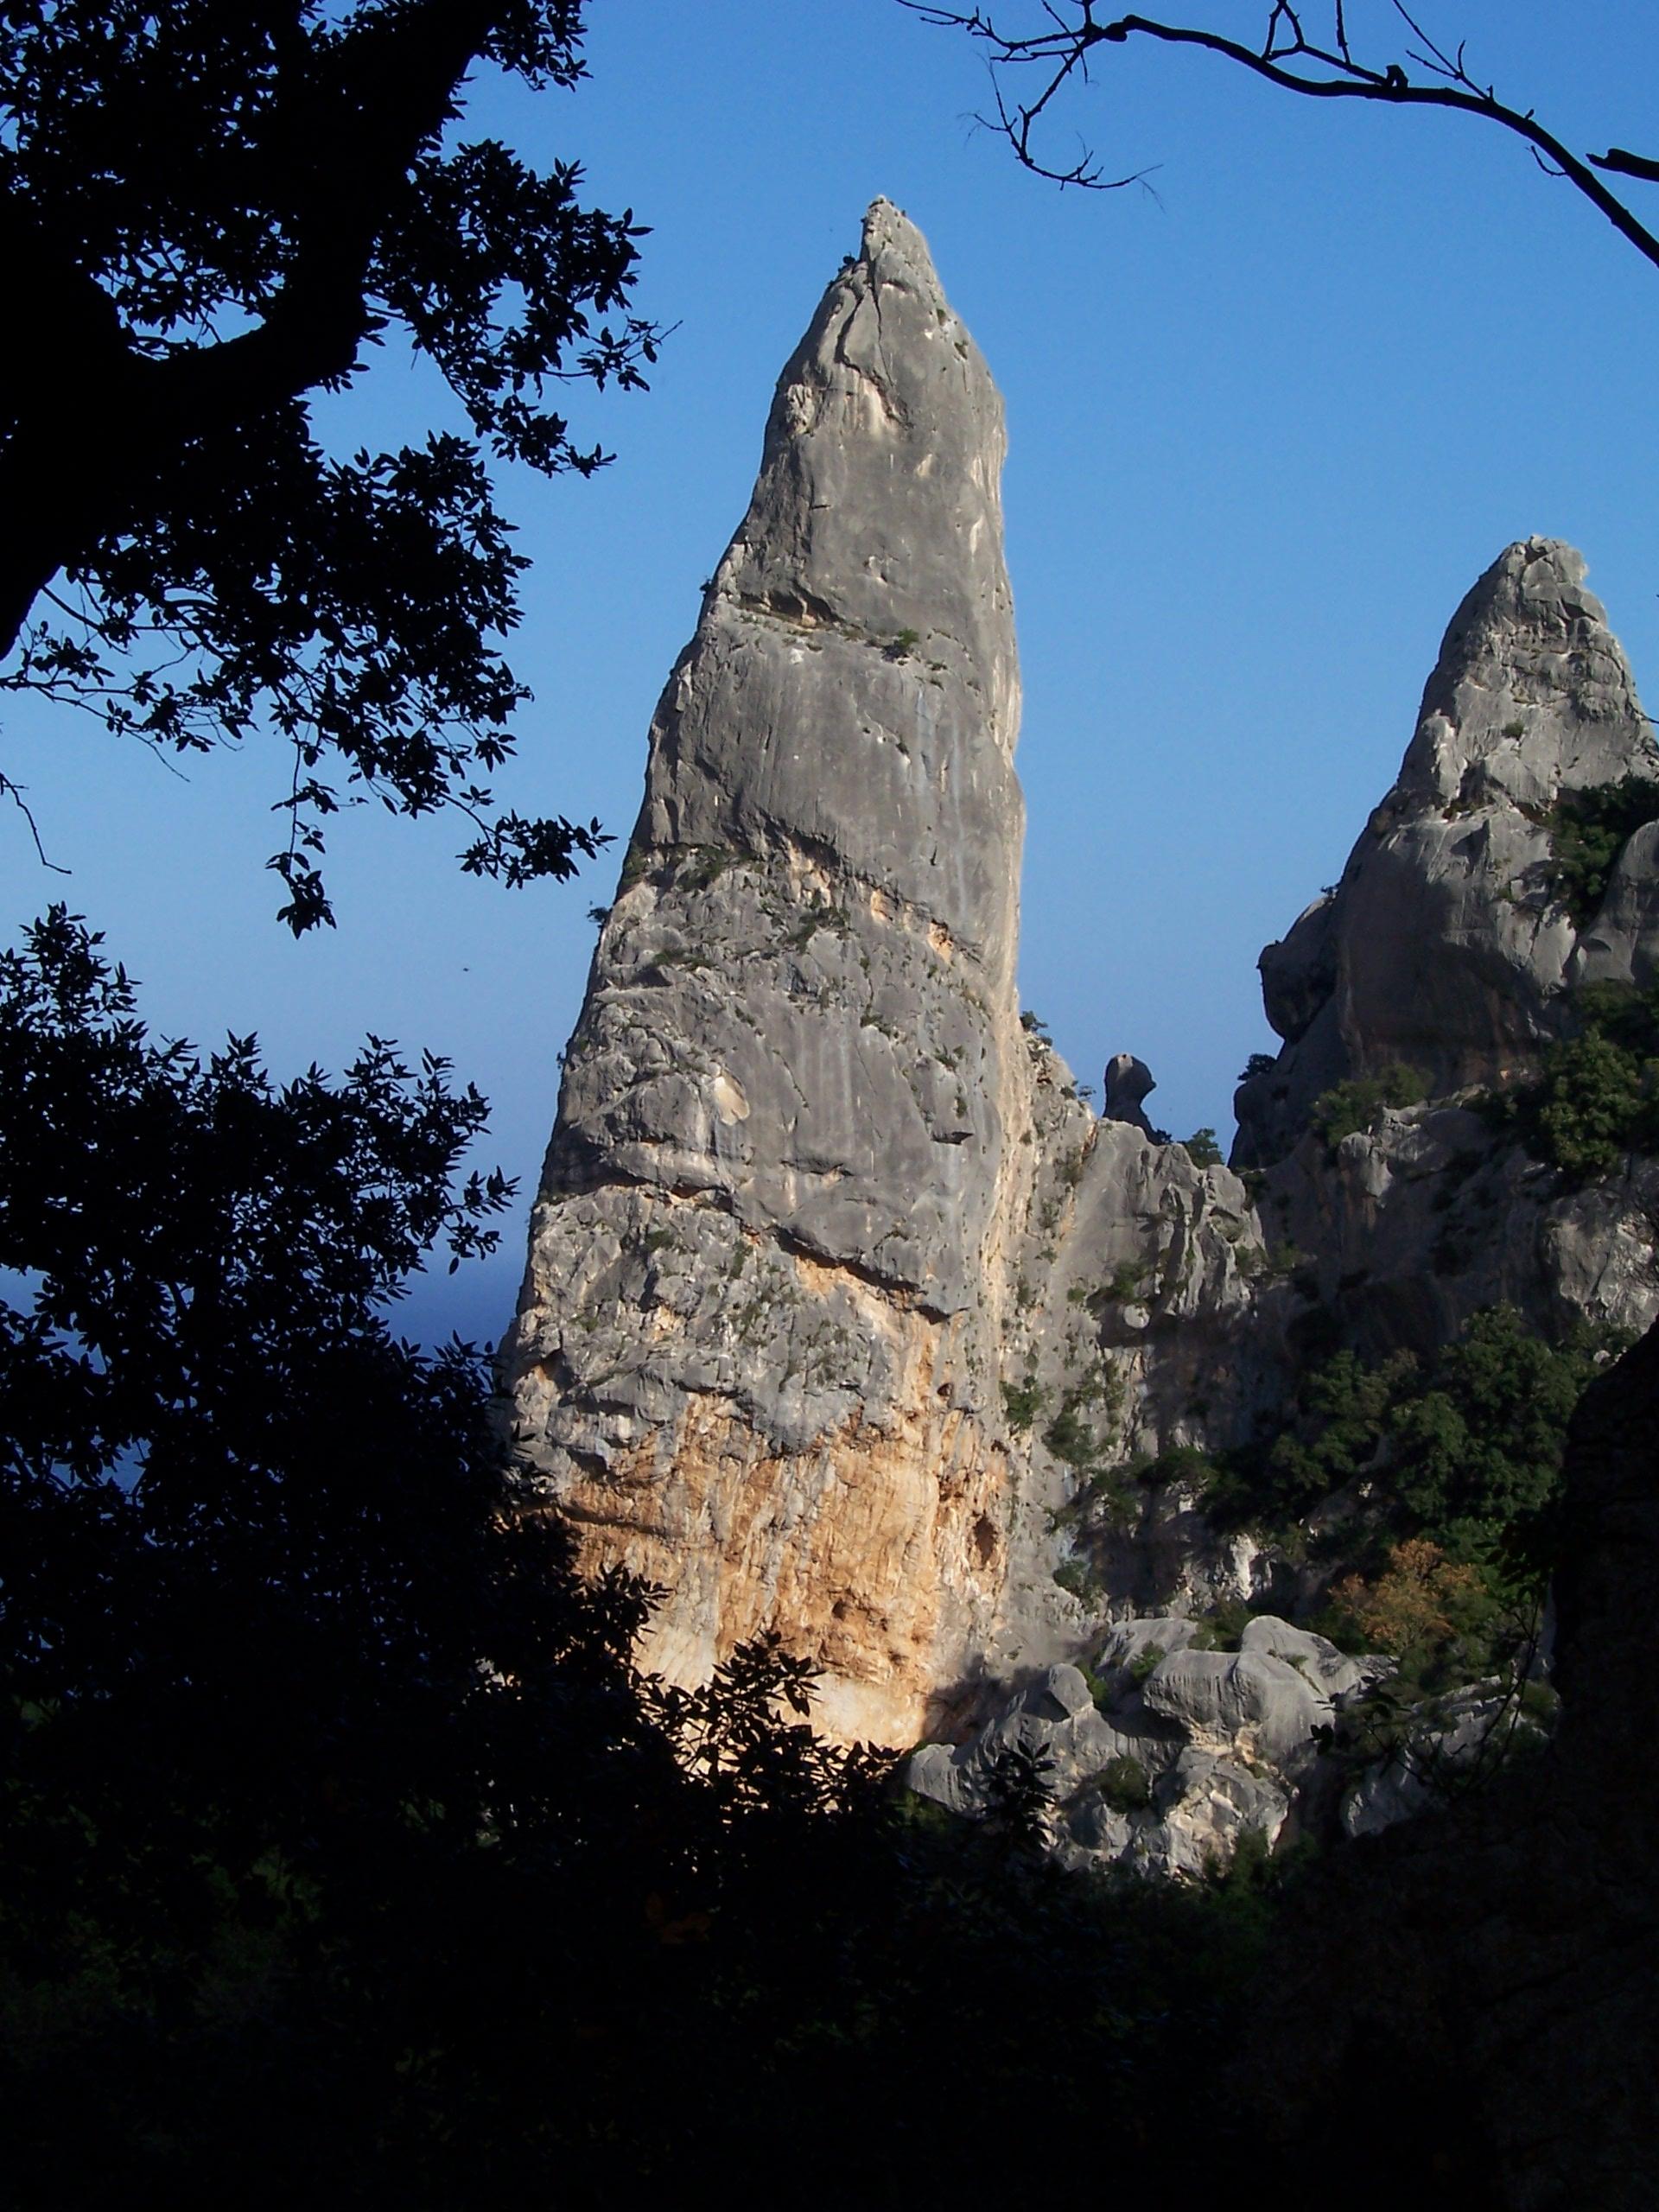 Aguglia of Goloritzé, restyling of Sardinia's famous tower